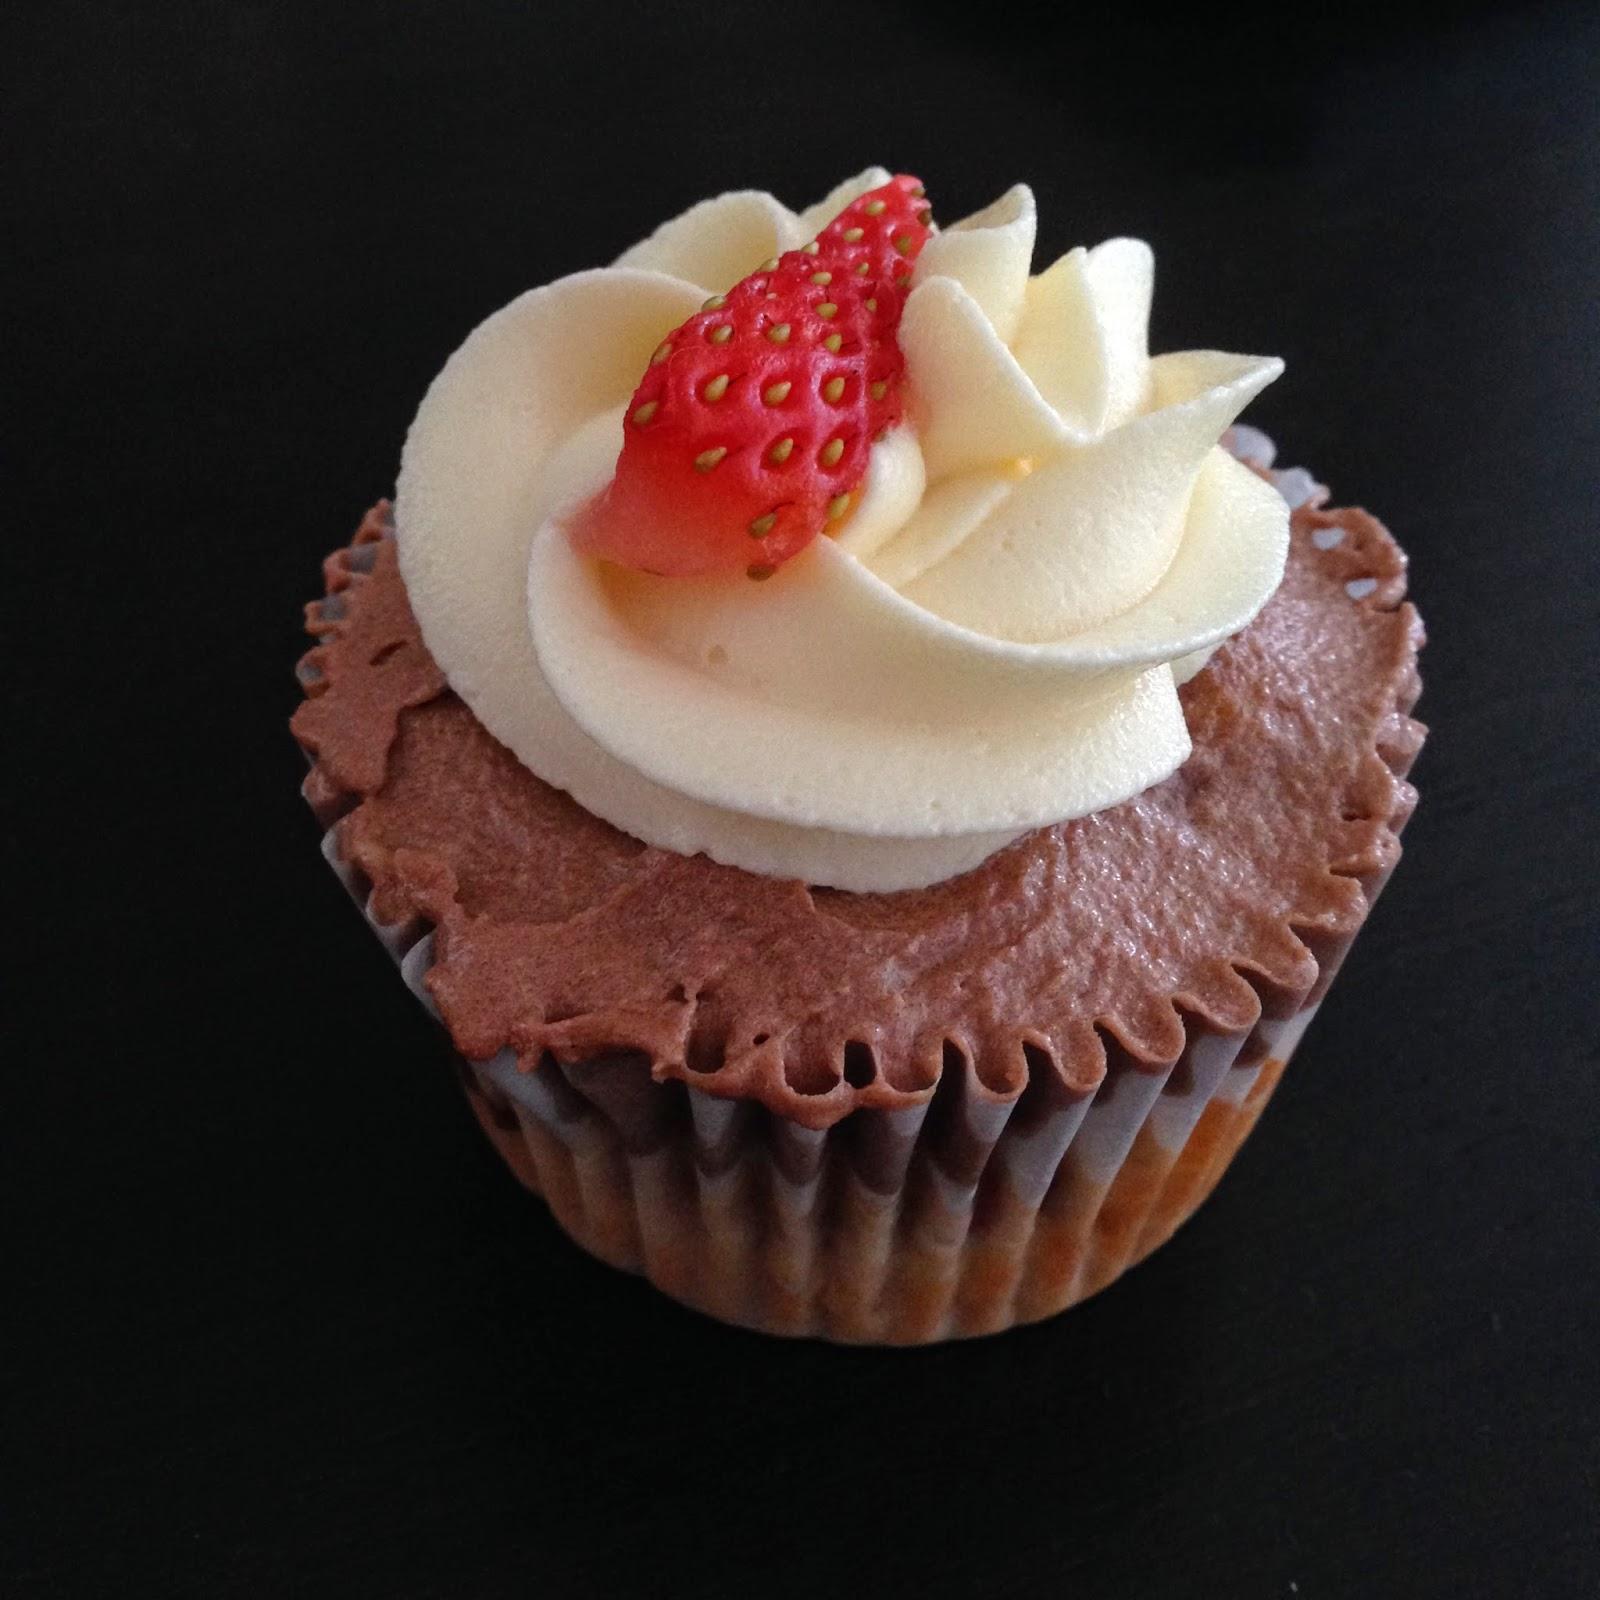 Neapolitan cupcake by SheaSonia